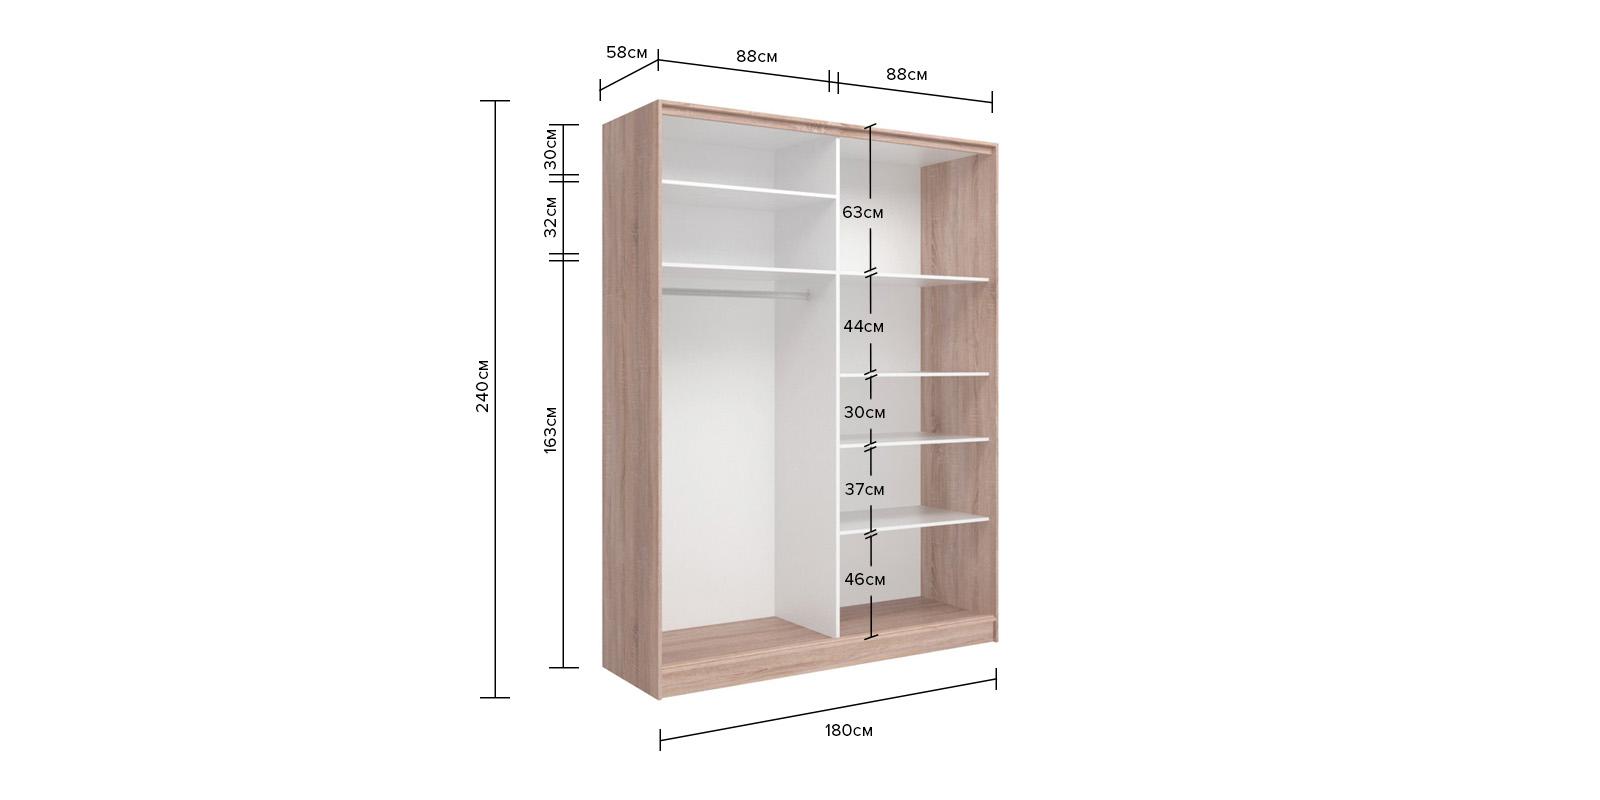 Шкаф-купе двухдверный Манхеттен 180 см (сонома/глухой)